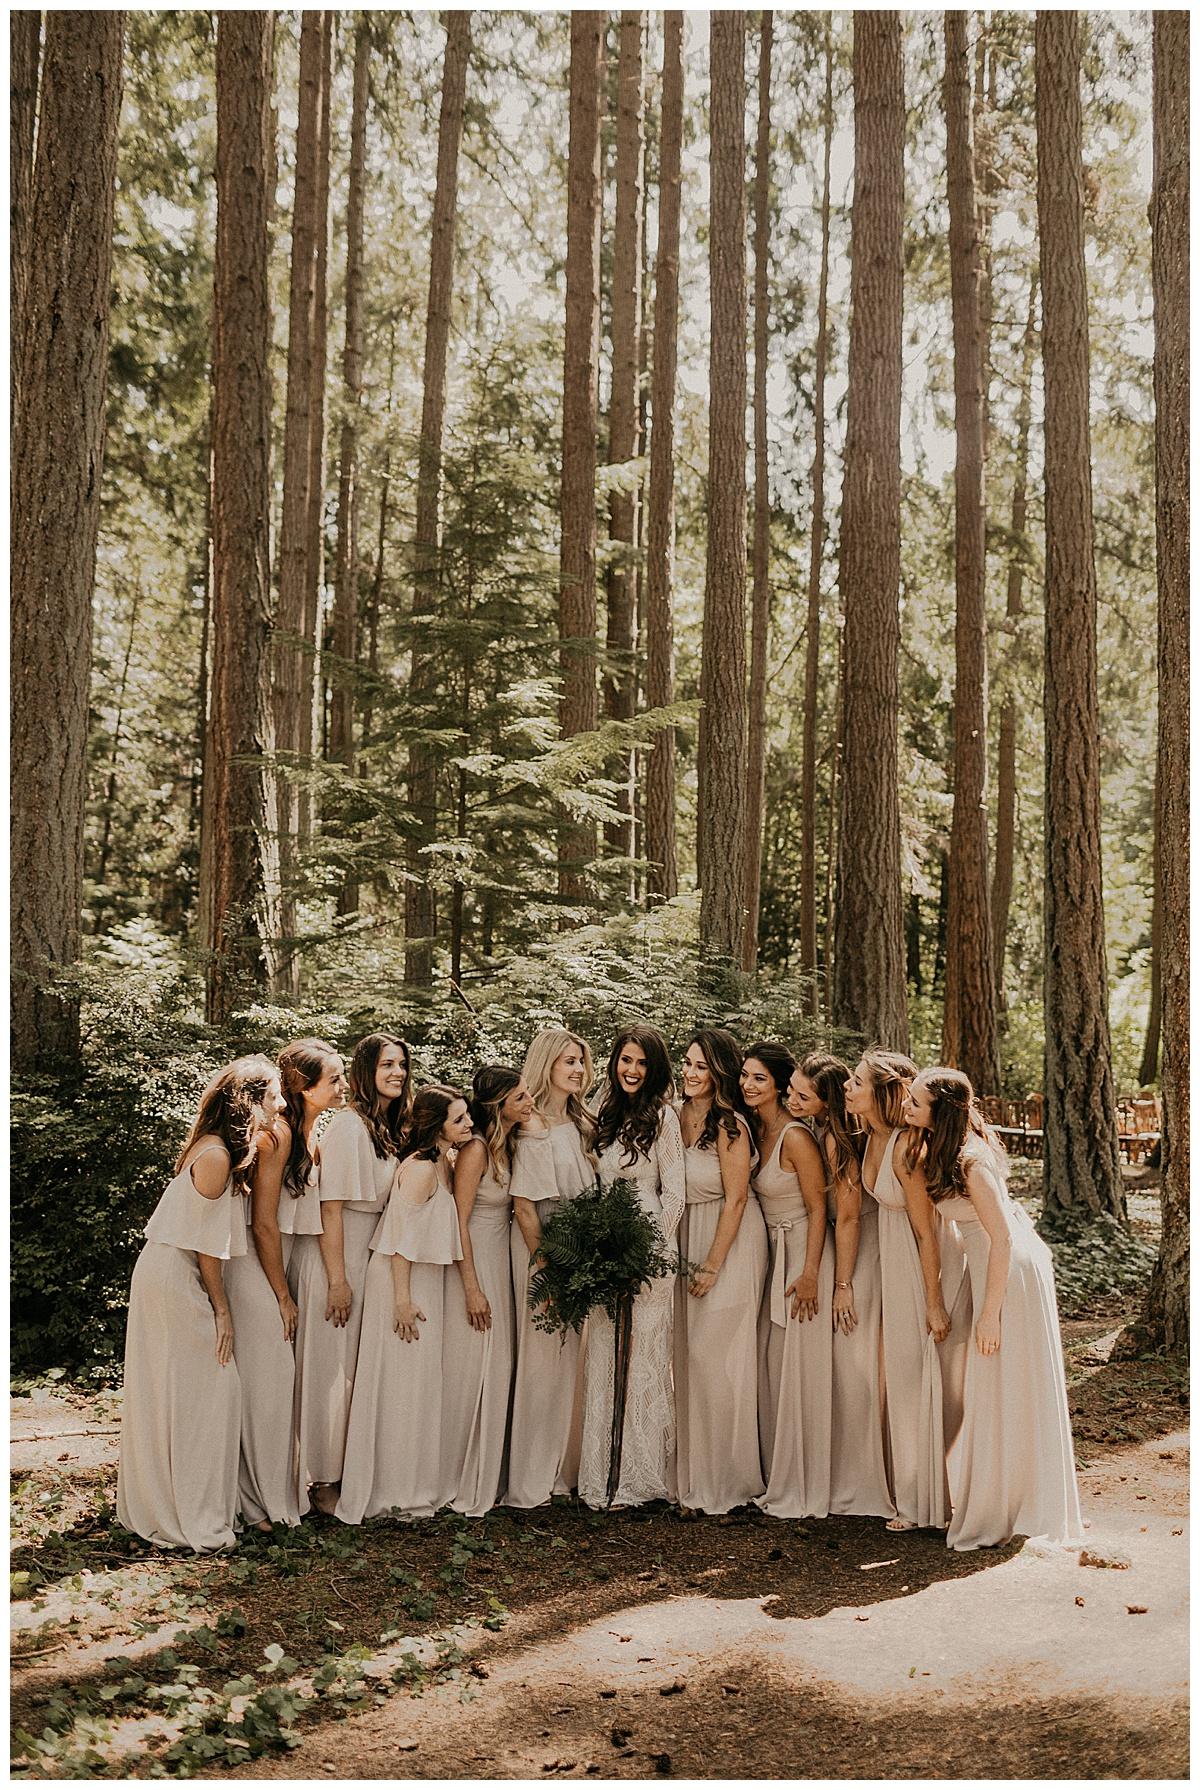 Bixby-+-Pine-Samantha-McFarlen-Kitsap-Memorial-State-Park-_0011.jpg